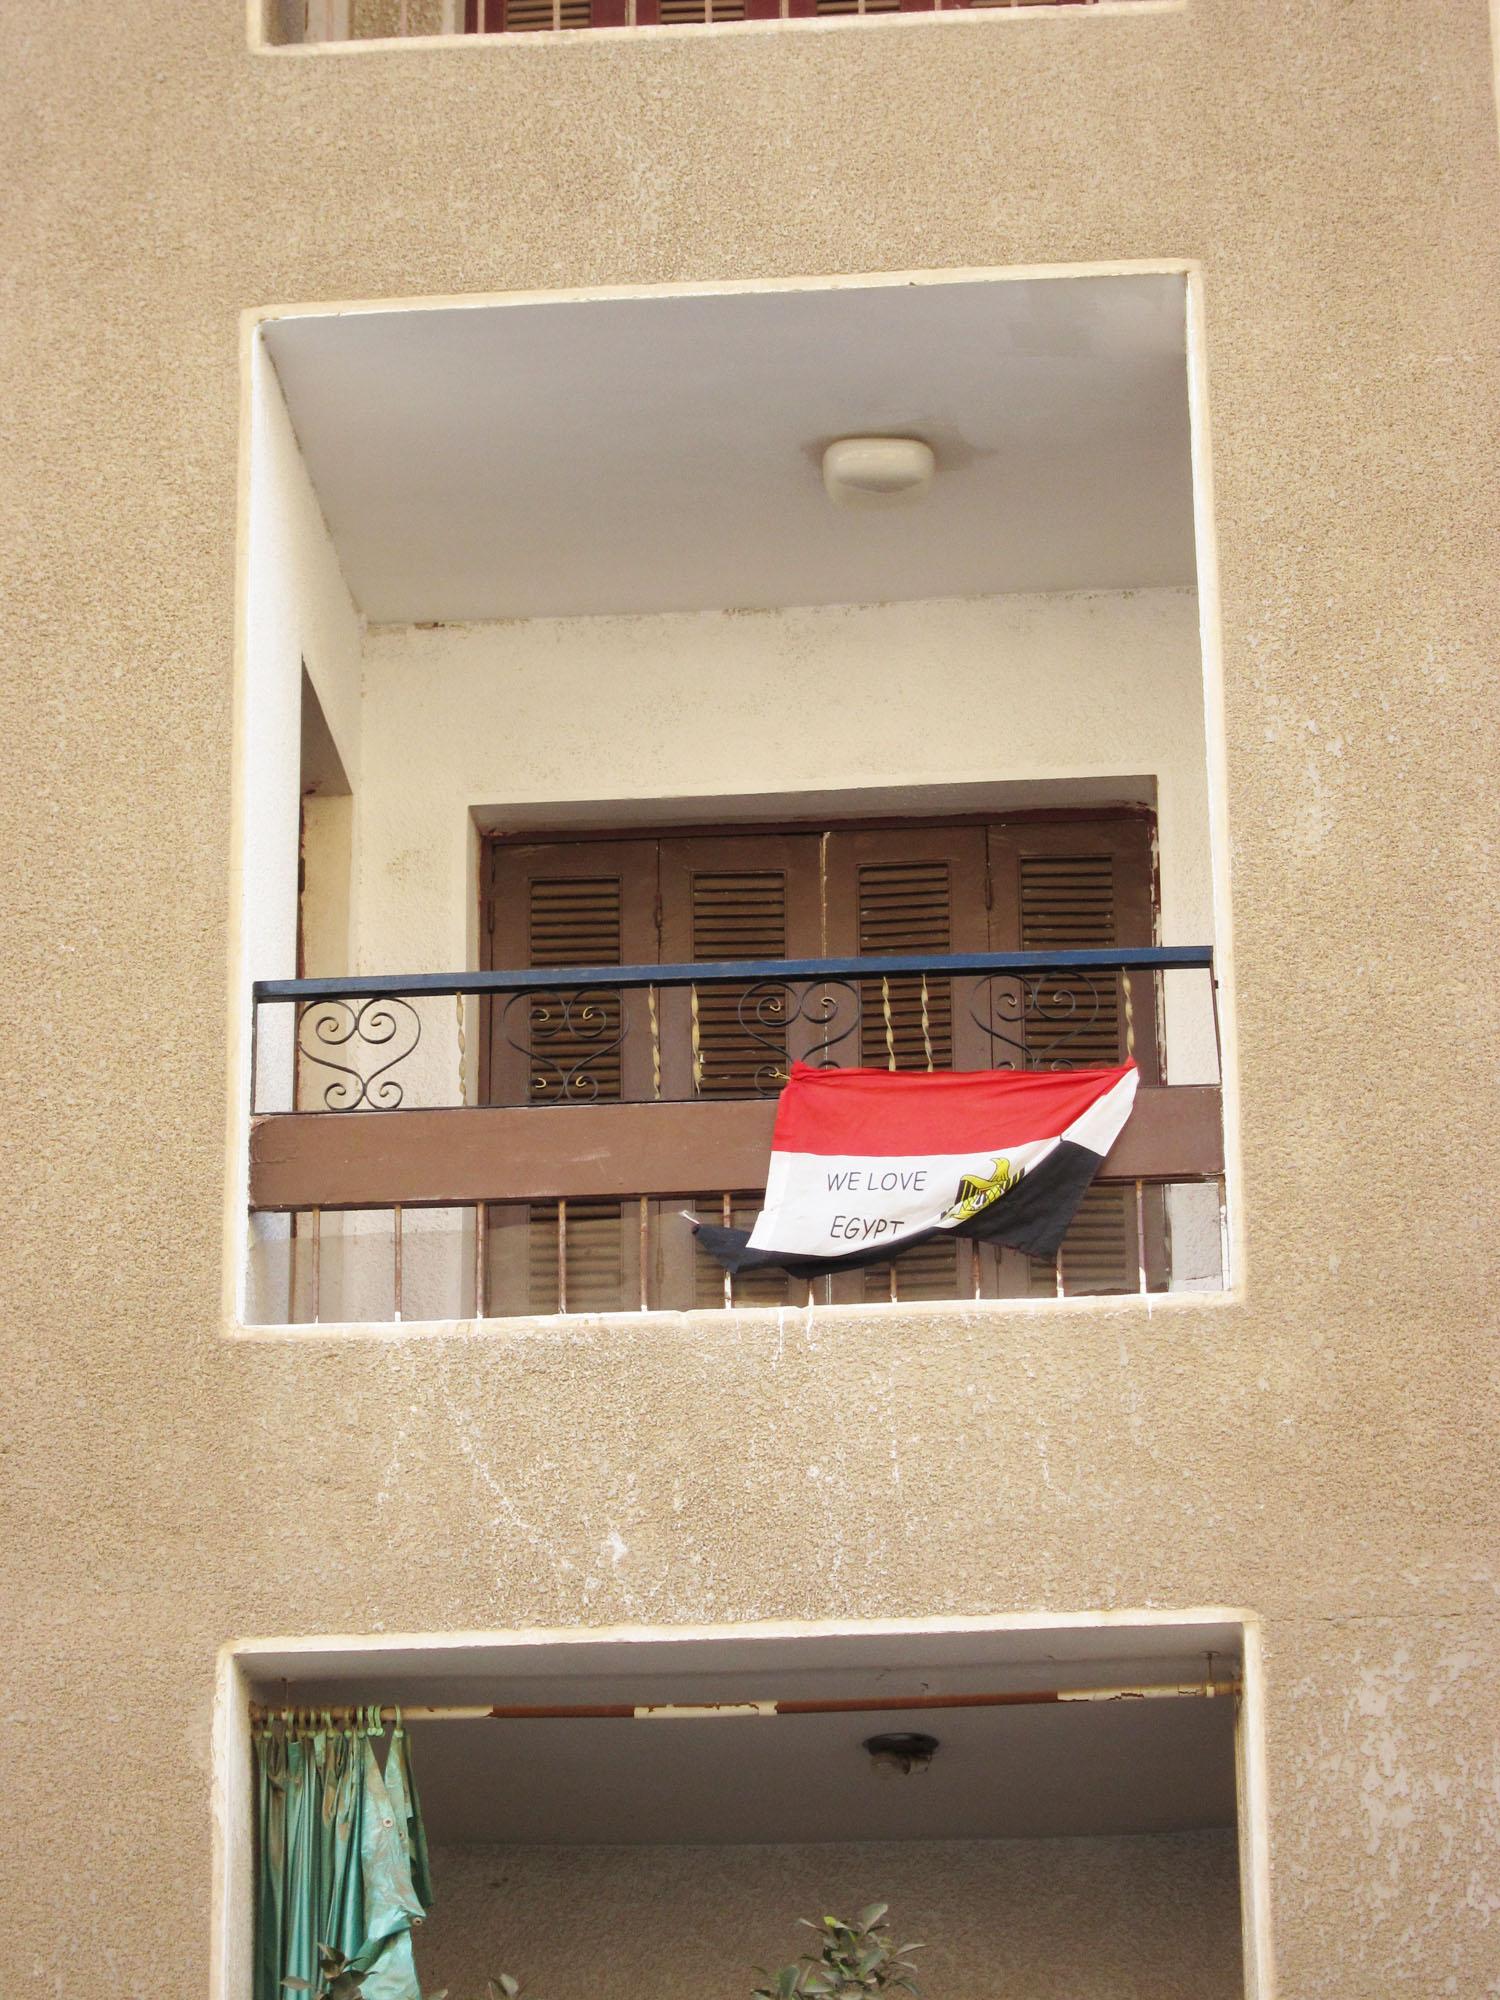 2013-04-05 Egypt day 11 04